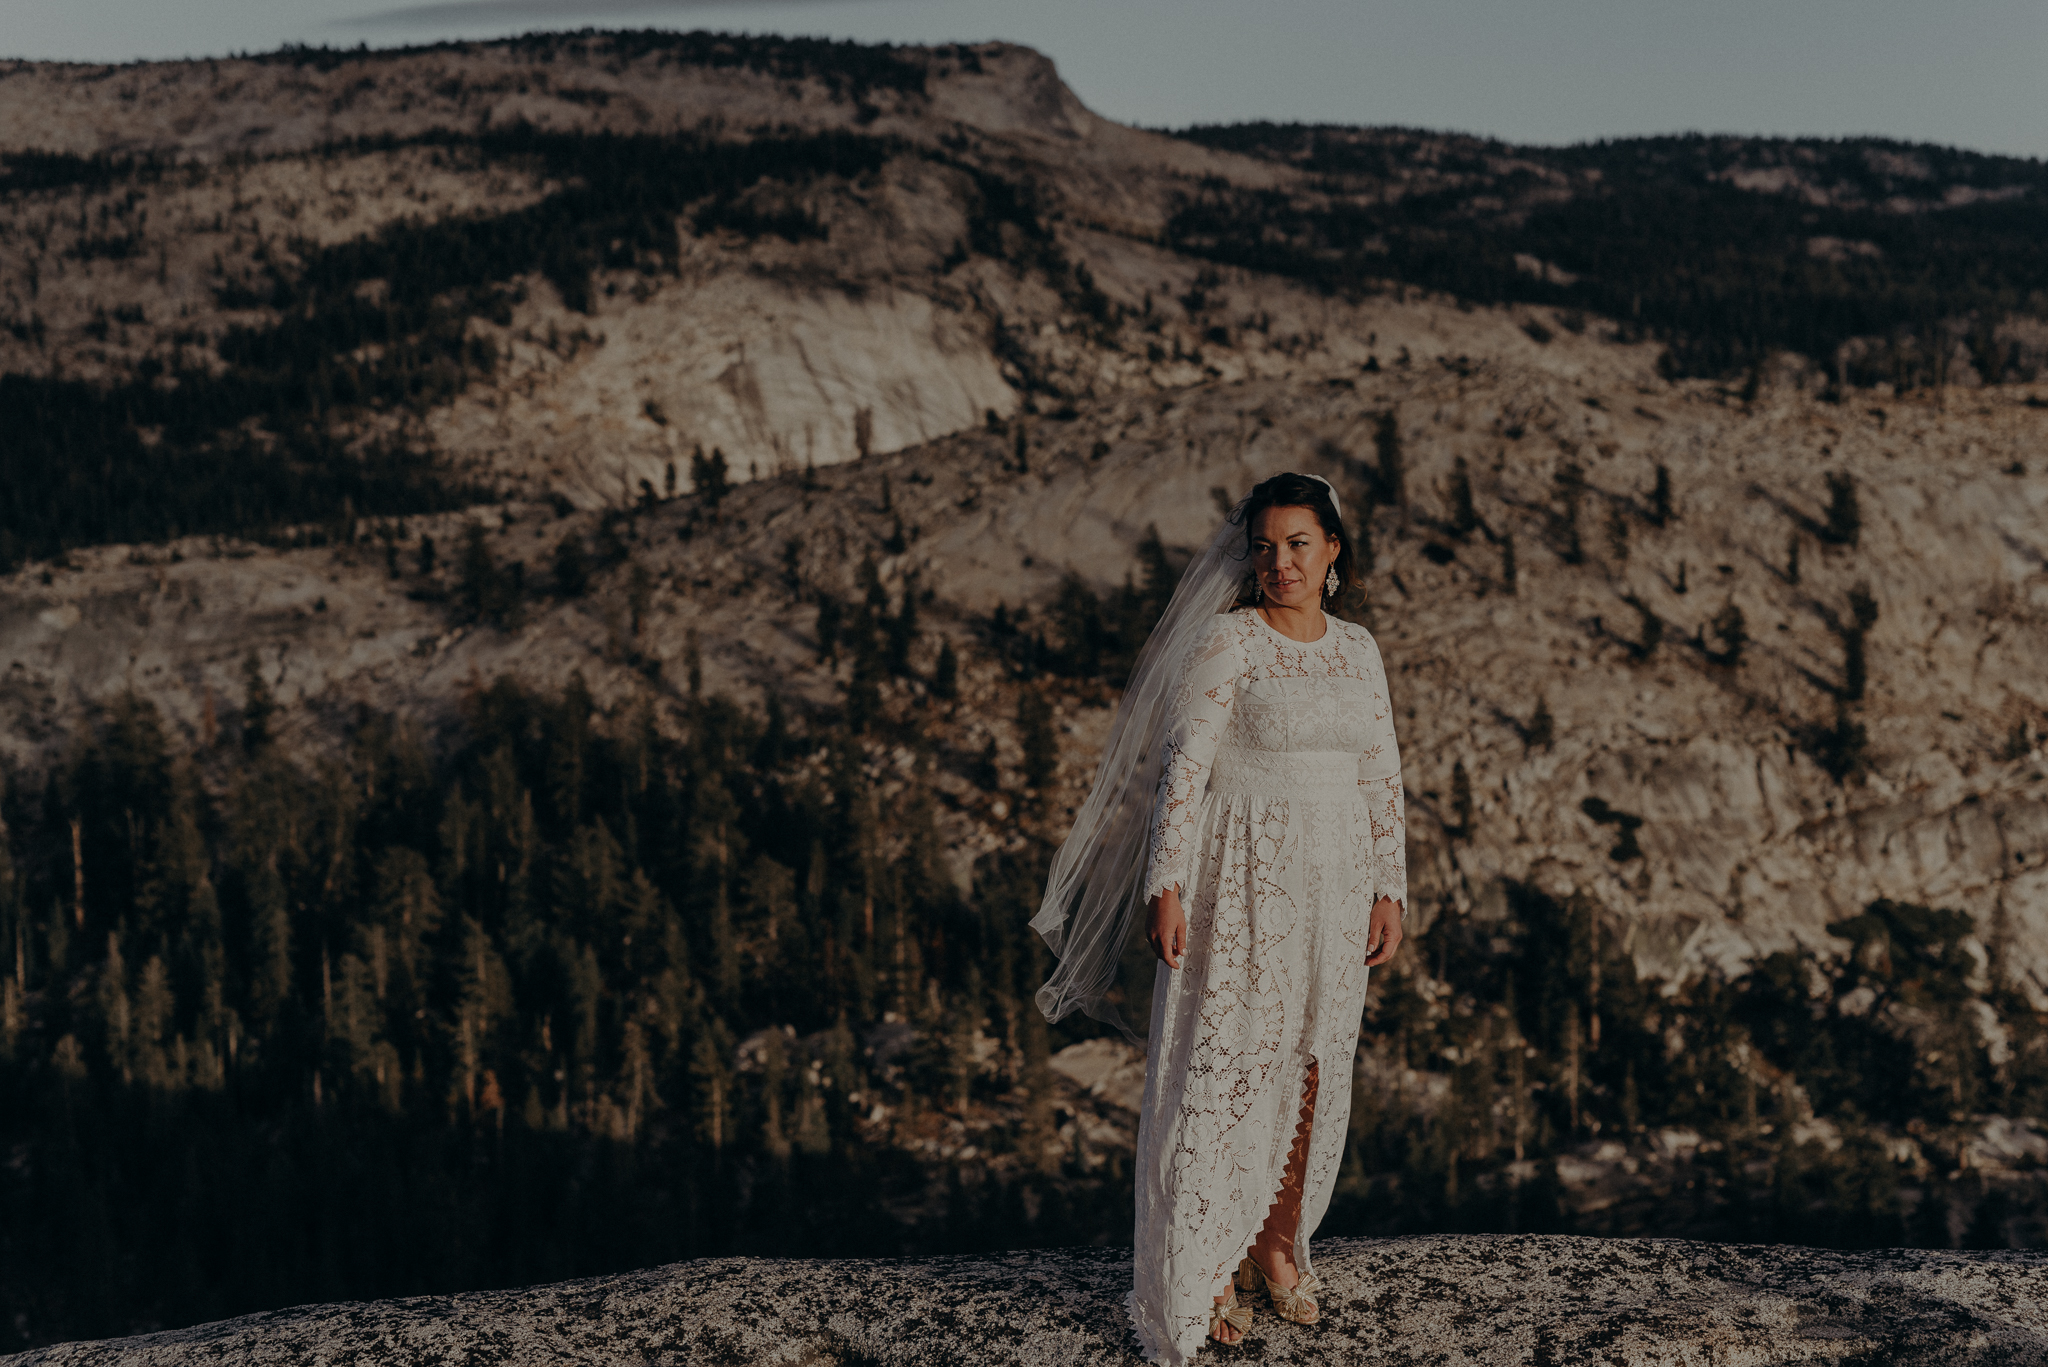 Yosemite Elopement Photographer - Evergreen Lodge Wedding Photographer - IsaiahAndTaylor.com-030.jpg